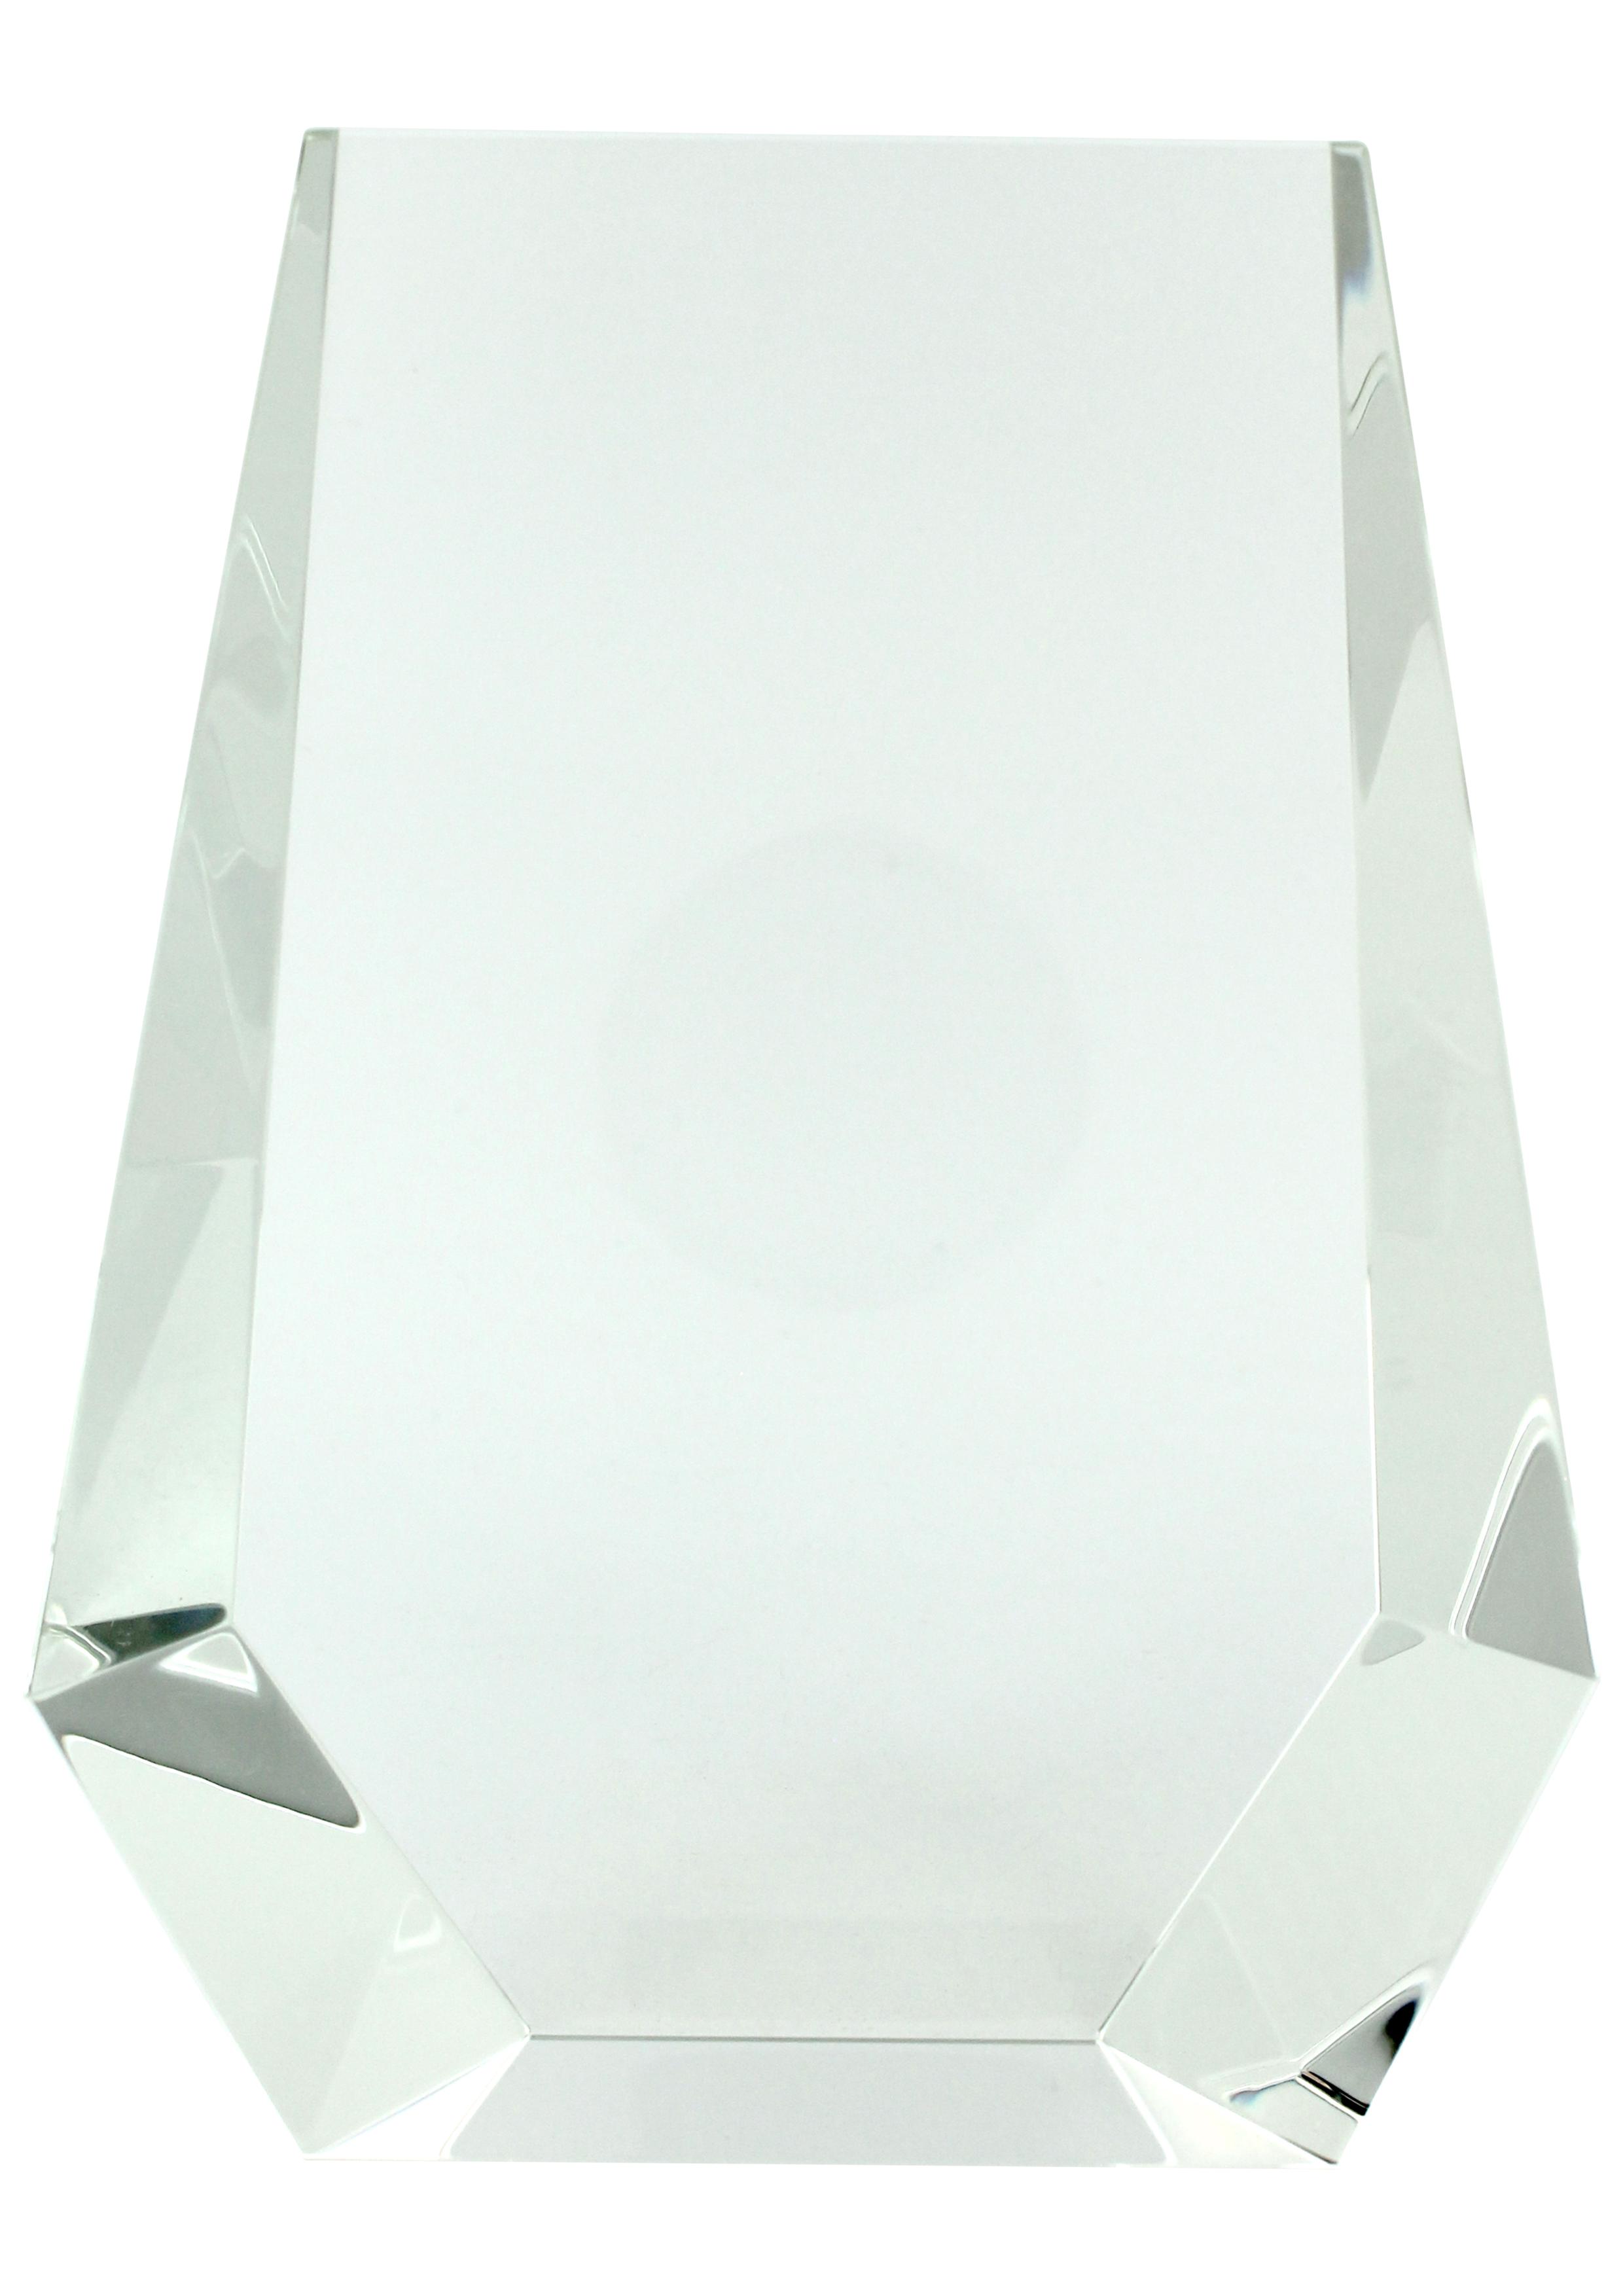 CC732 Crystal Award Image